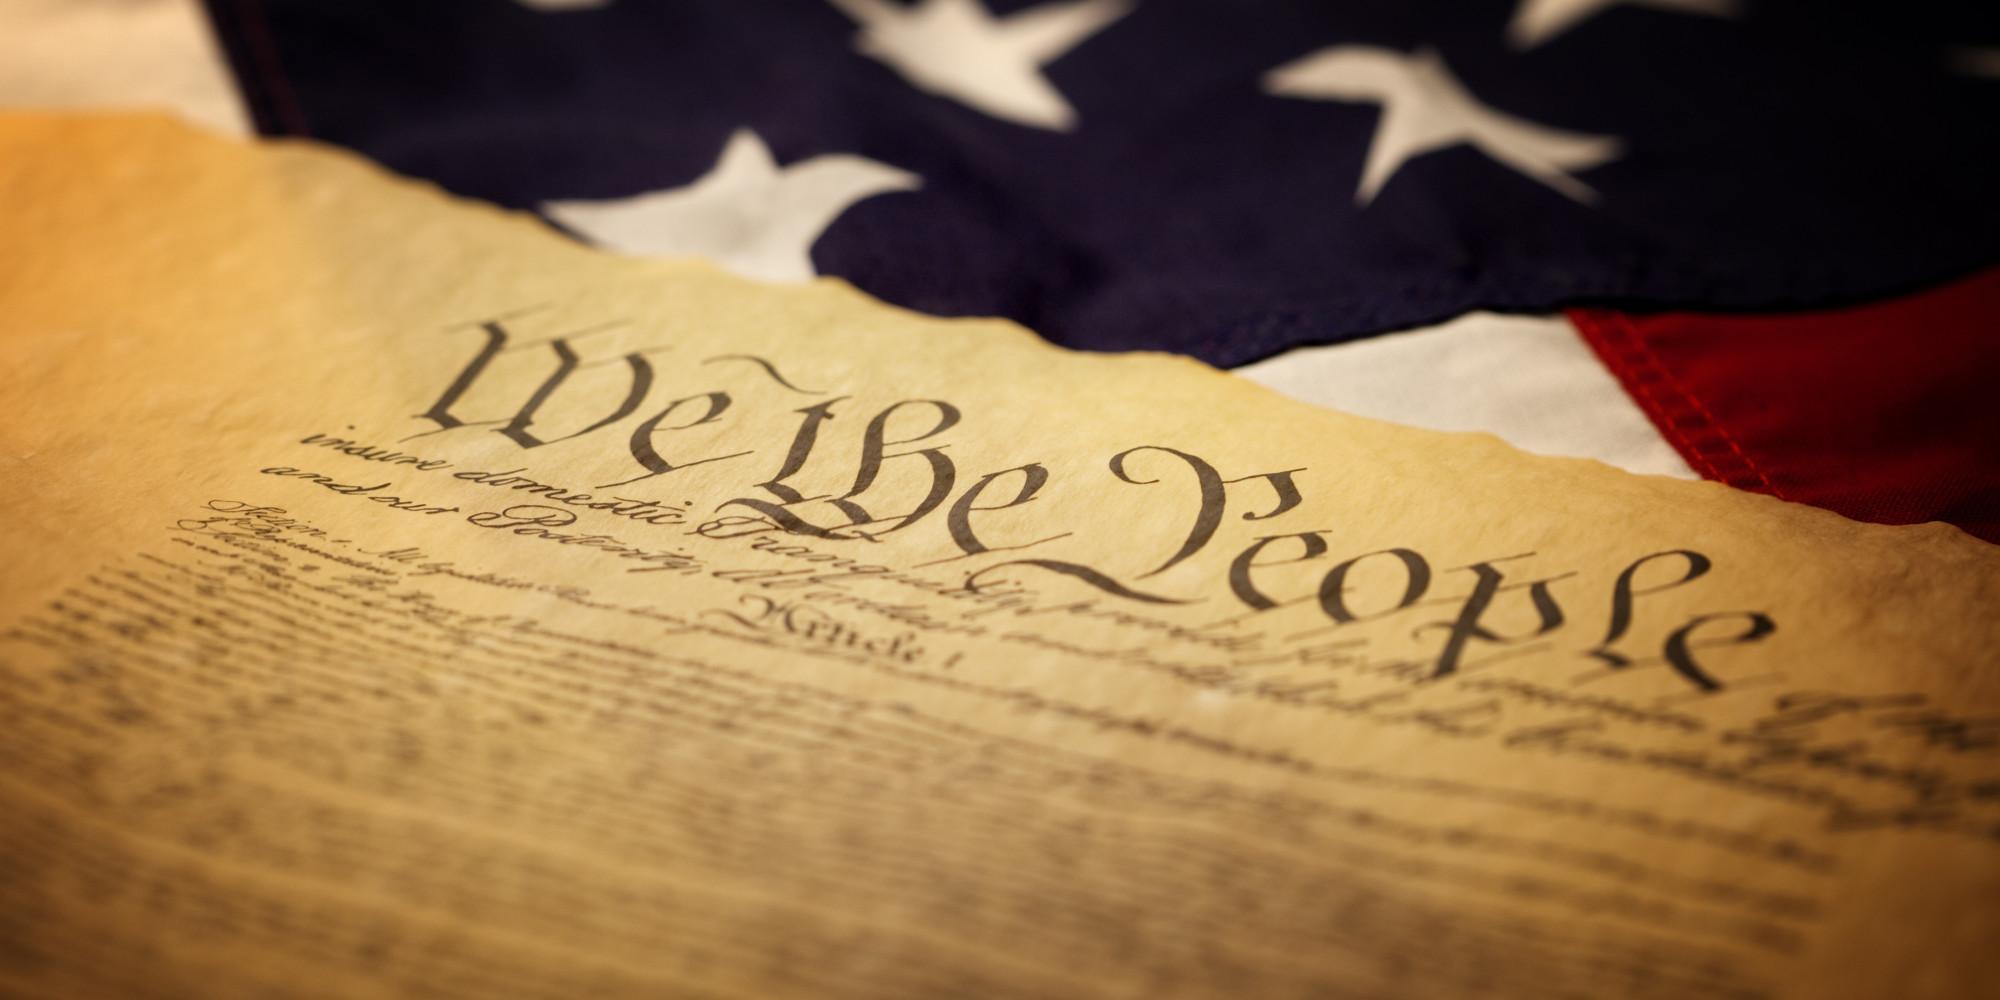 Teacher S Constitutional Warning John Dryden Informs